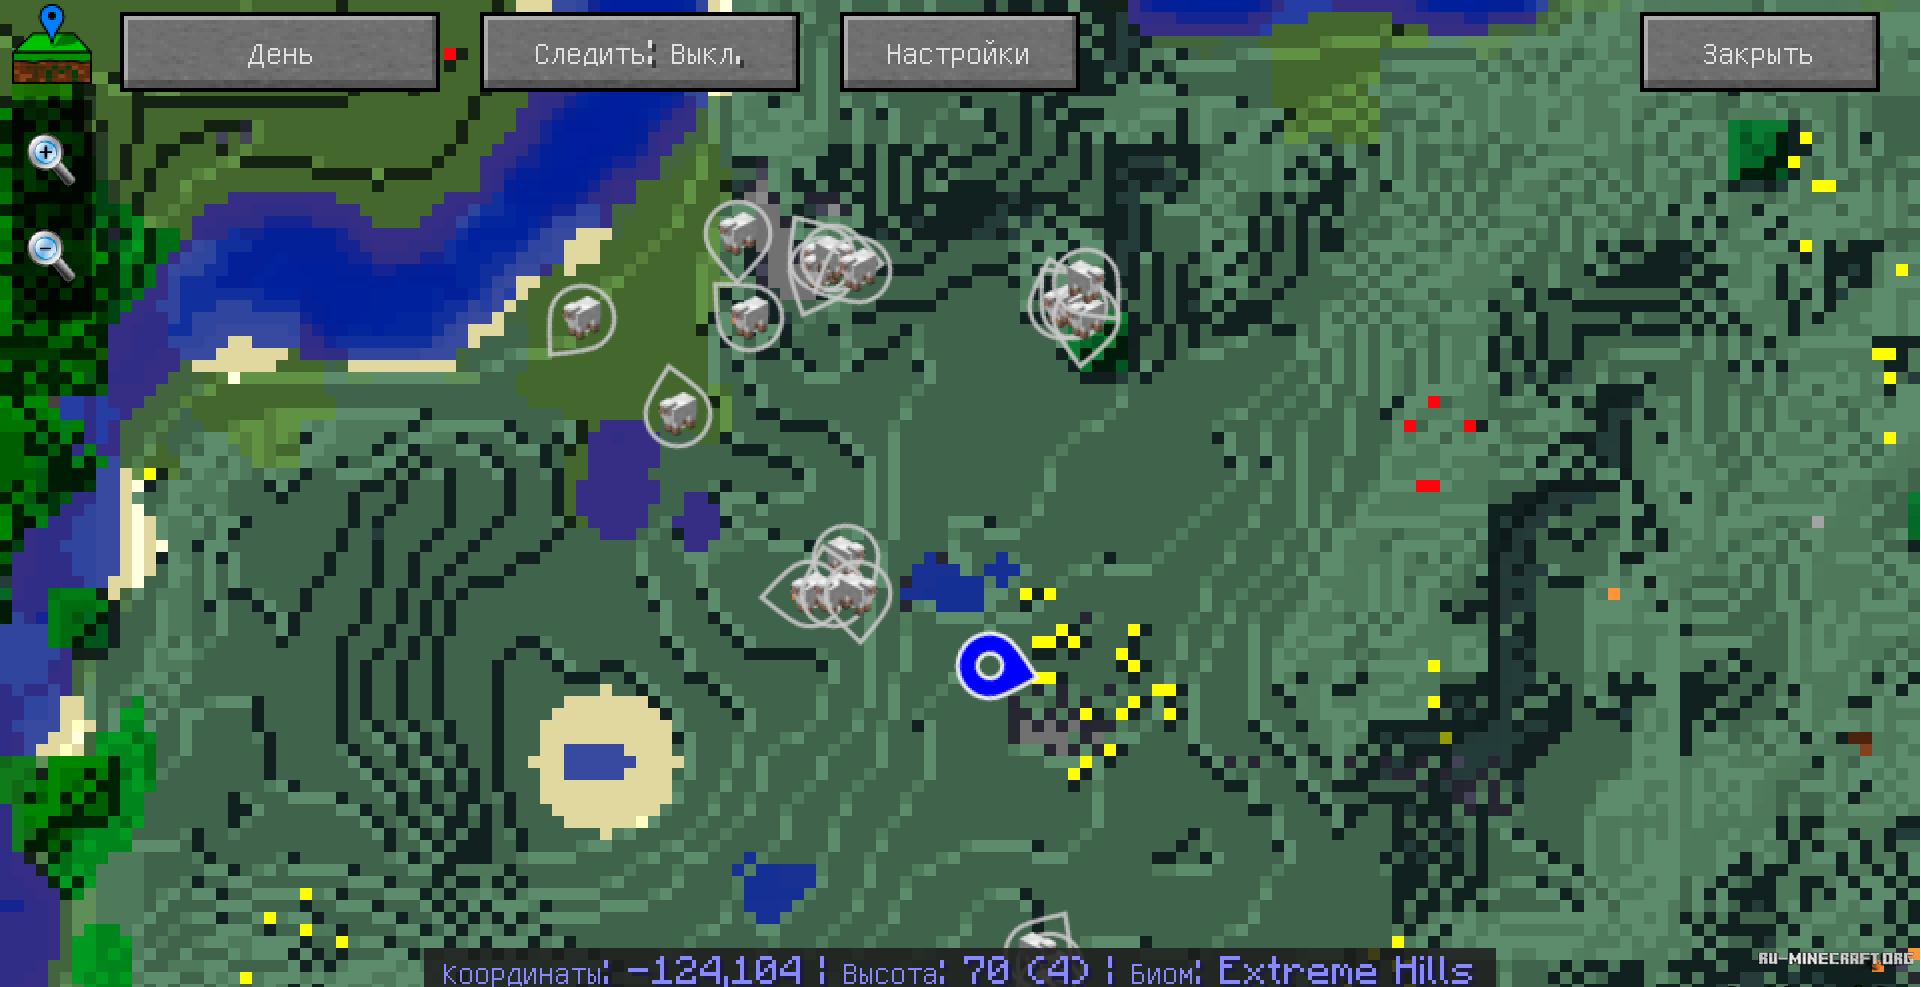 Мод на карту journeymap для minecraft 1. 9/1. 8. 9/1. 8/1. 7. 10.